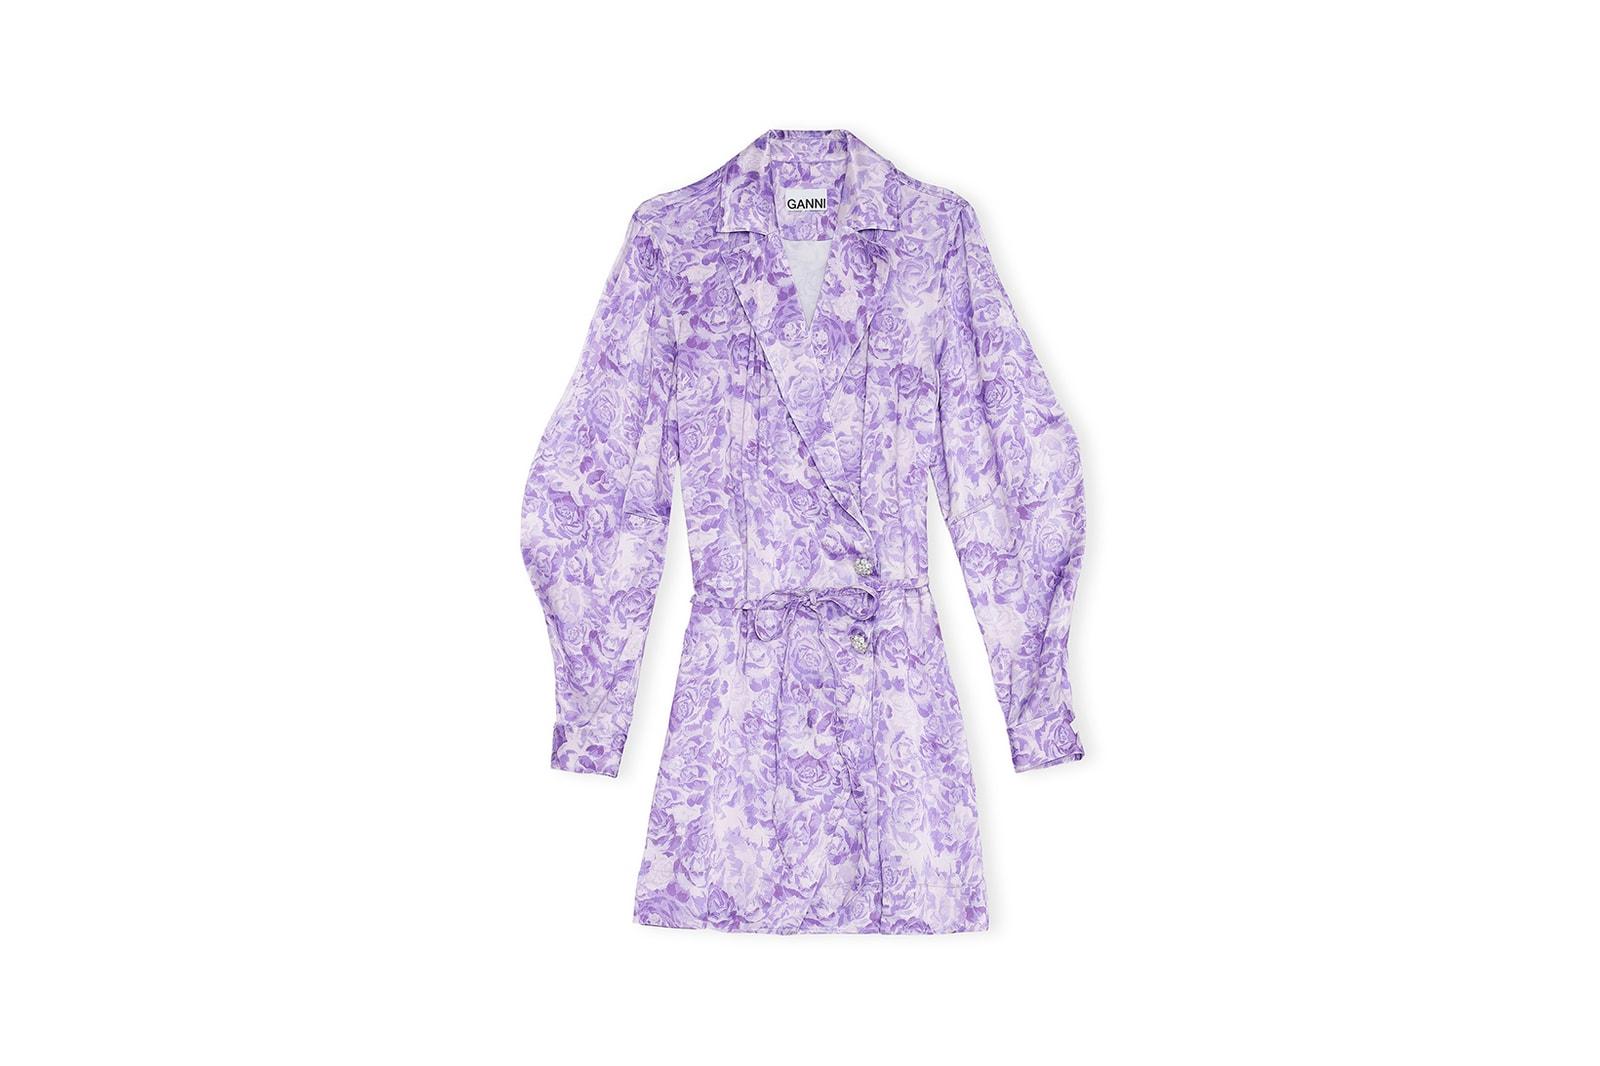 GANNI Spring/Summer 2020 Collection Campaign Tiger Stripe Print Dress